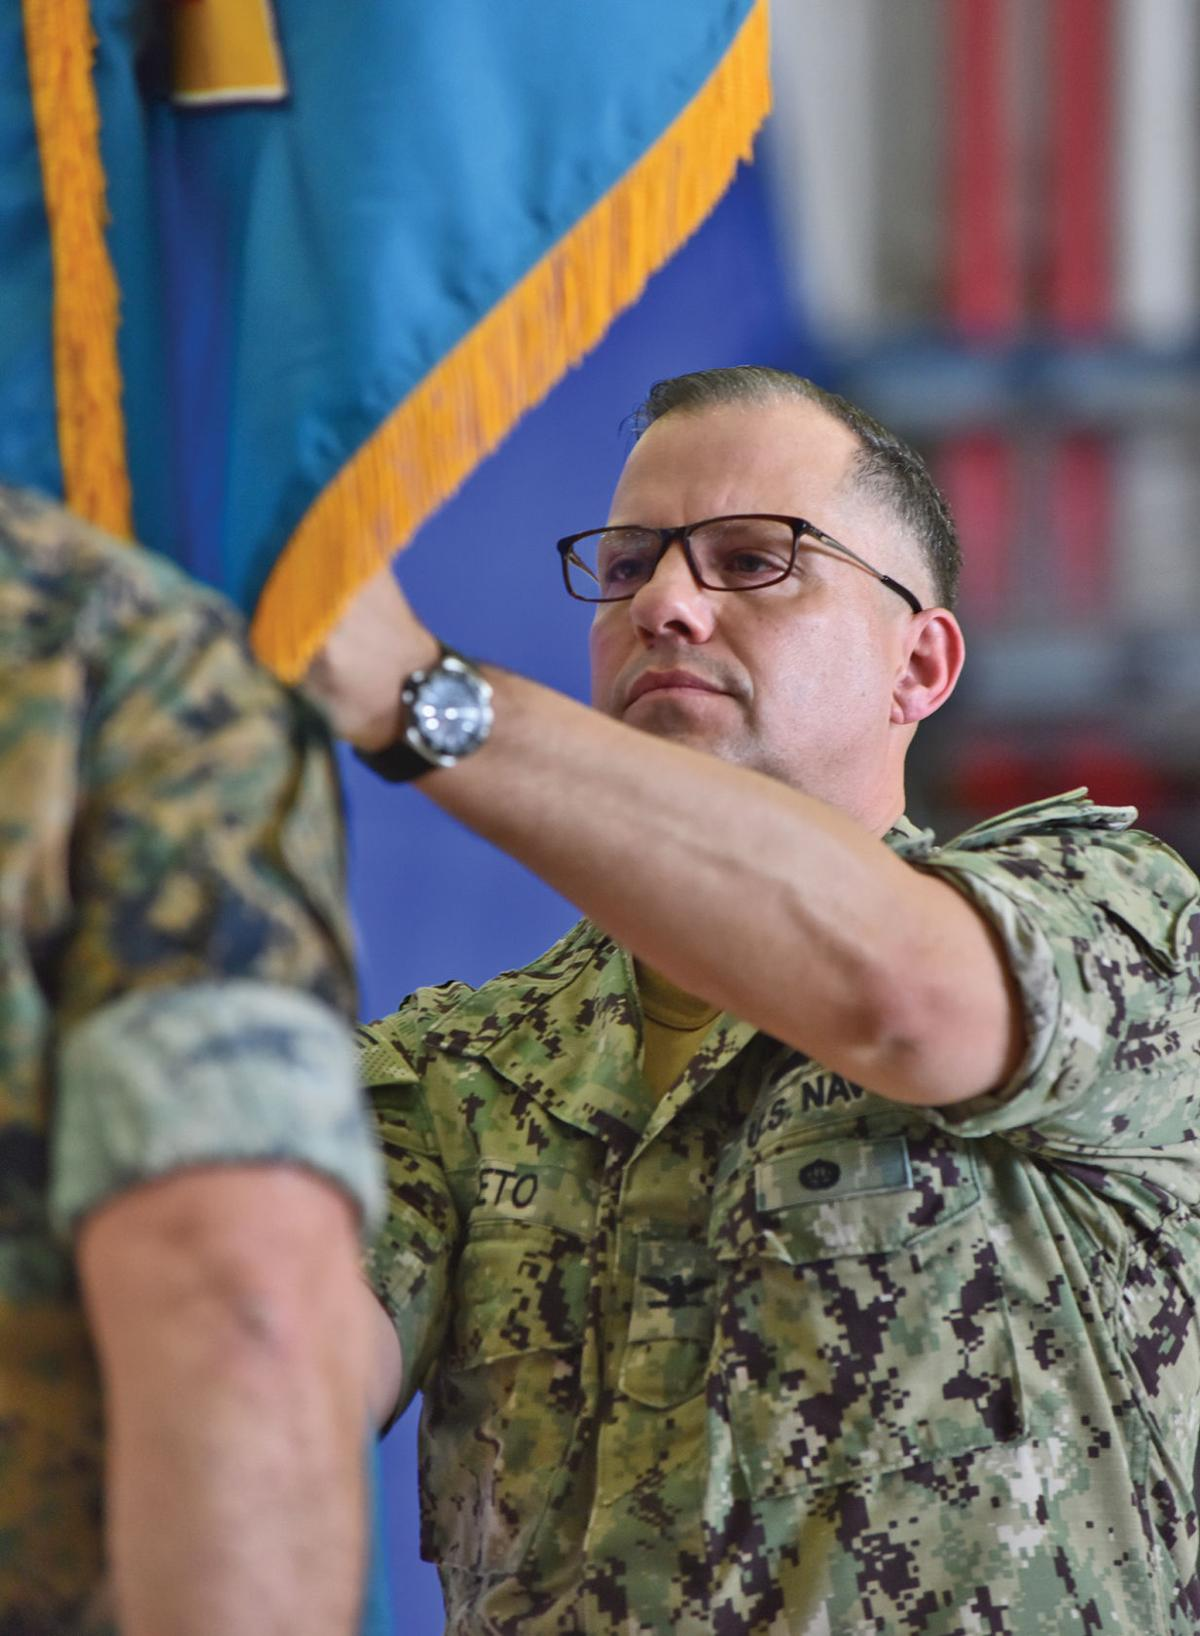 Capt. Mark Nieto